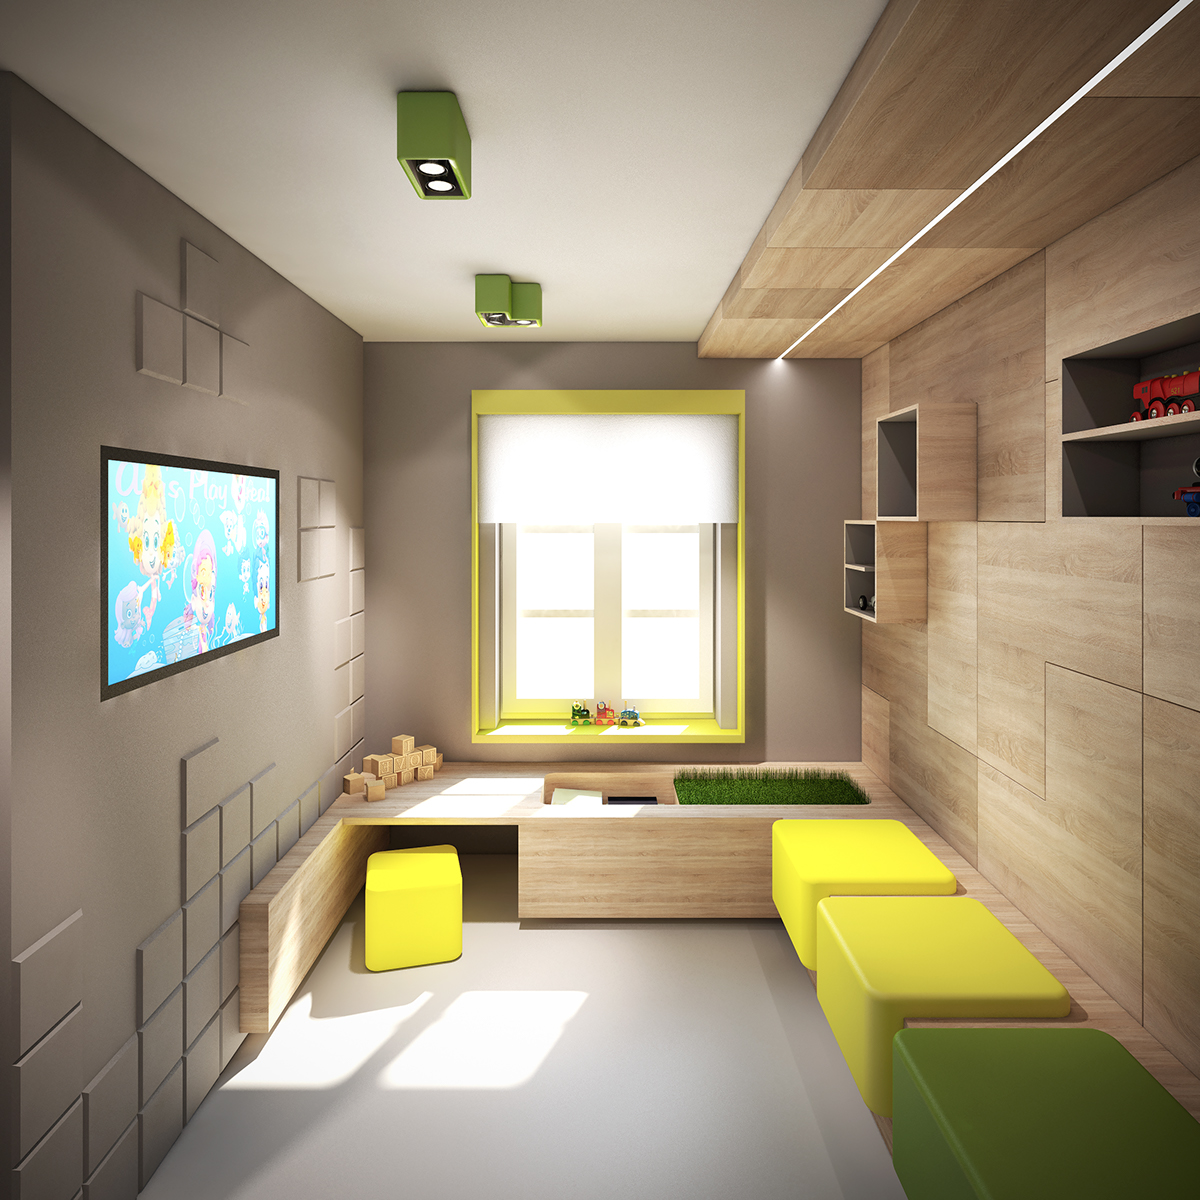 interior design for pediatric practice on behance. Black Bedroom Furniture Sets. Home Design Ideas